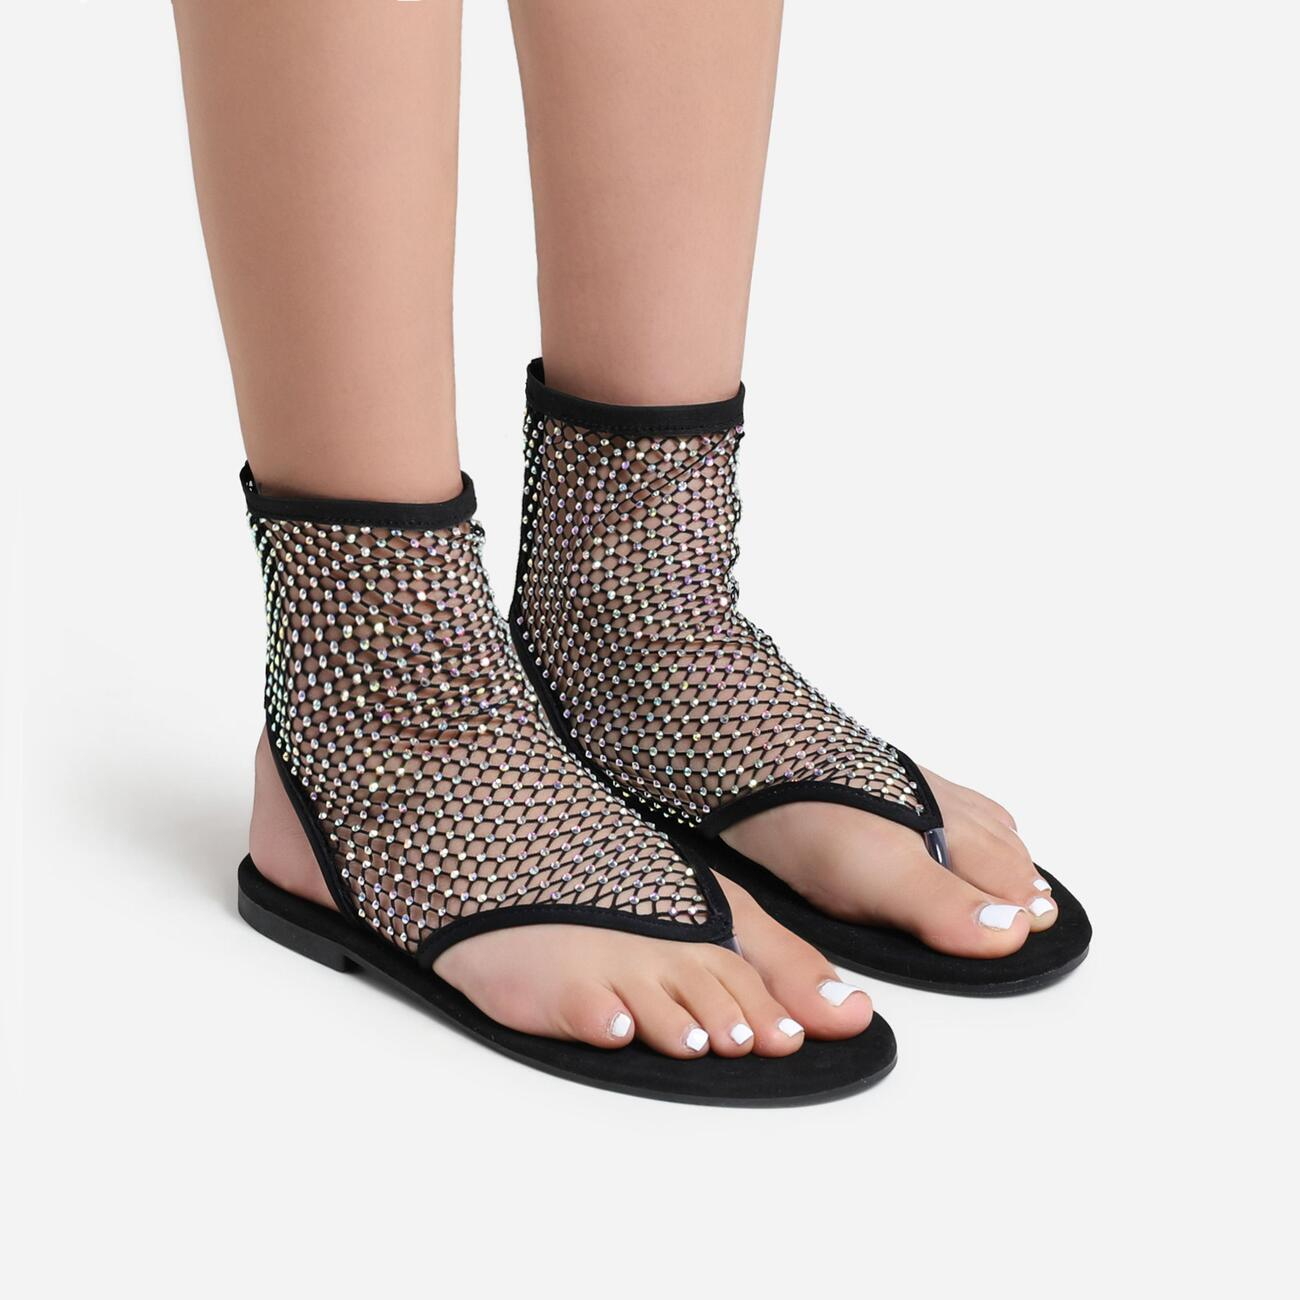 Glide Diamante Detail Ankle Flat Sandal In Black Fishnet Image 1